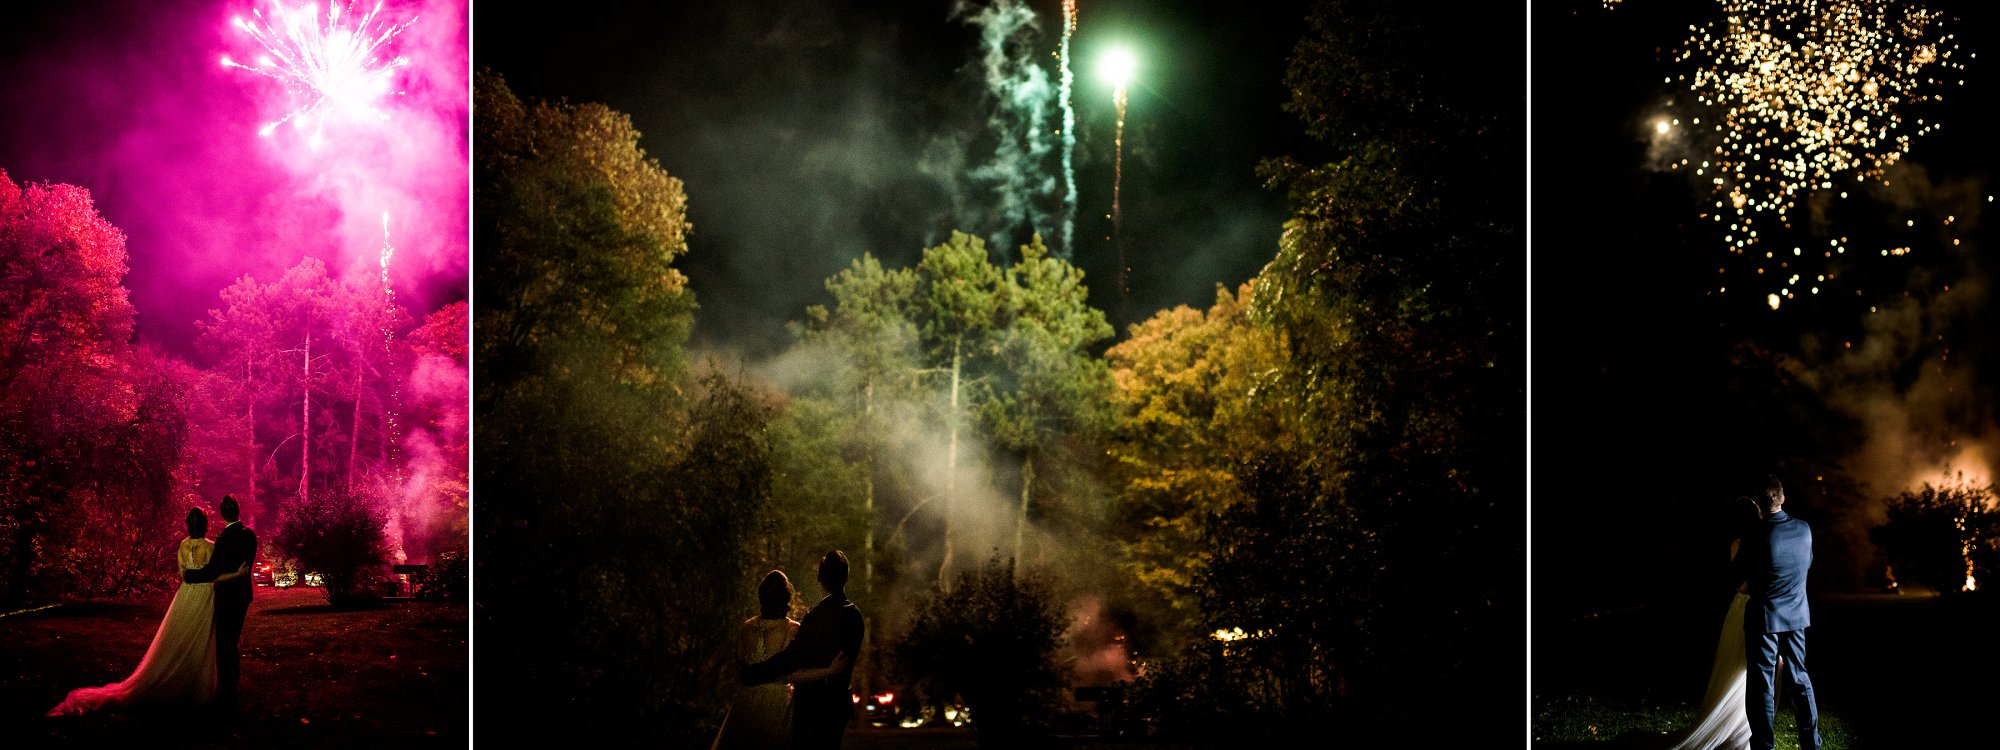 Firework Photos at weddings